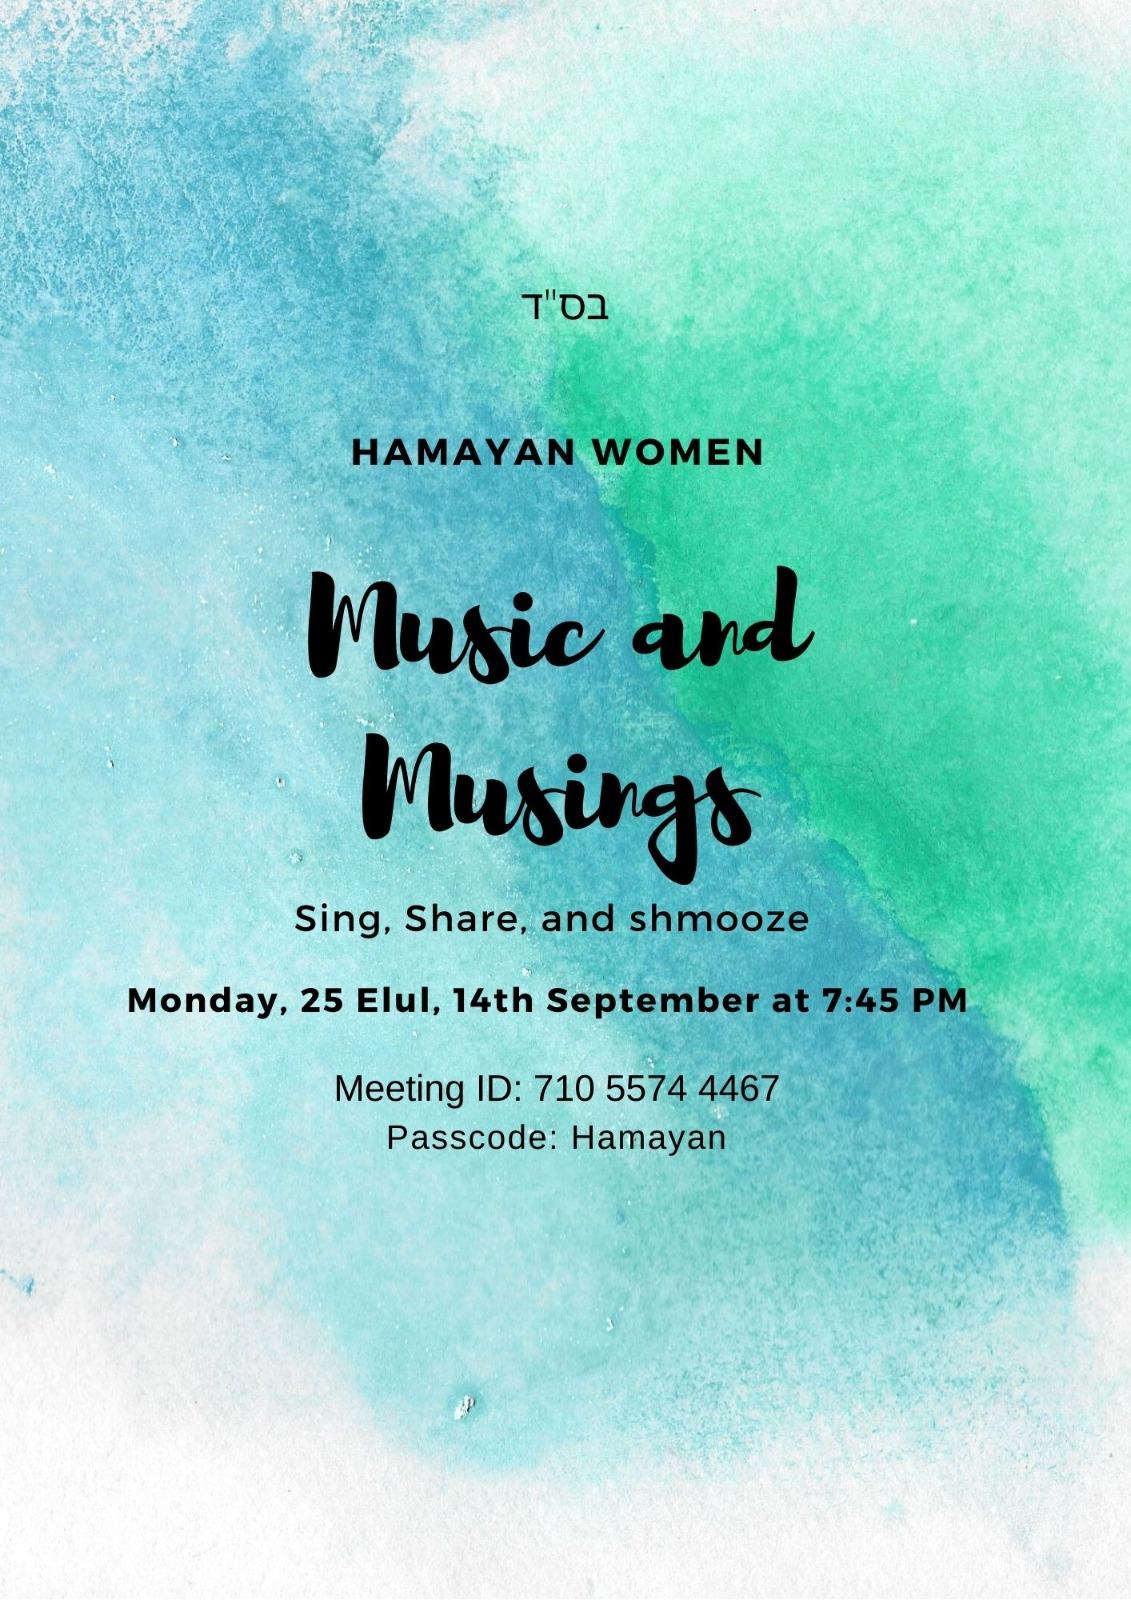 Music and Musings